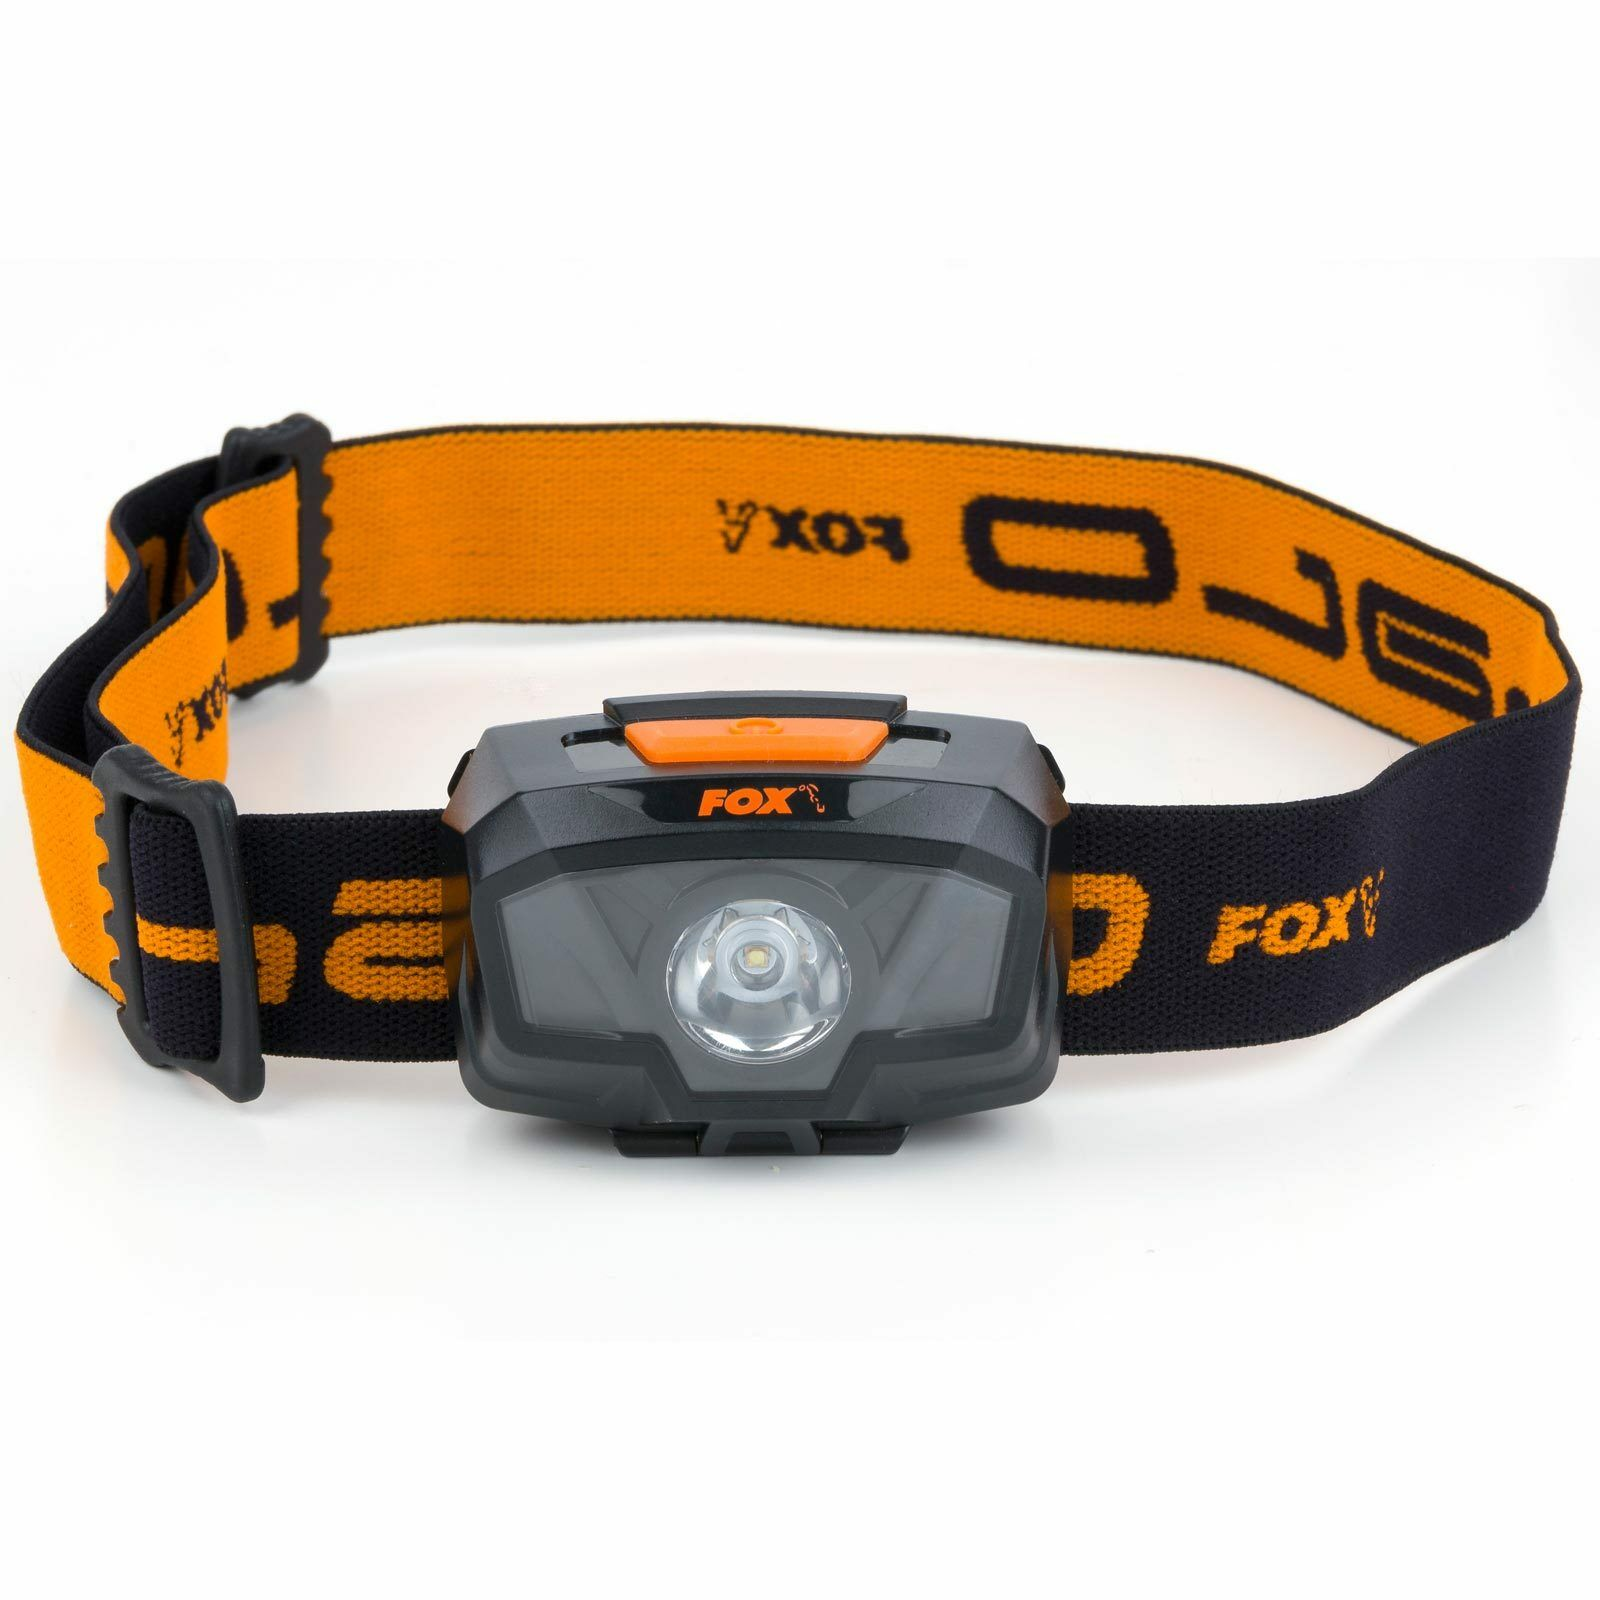 Fox testa lampada strinlampe-Halo 200 headtorch 200 Lumen